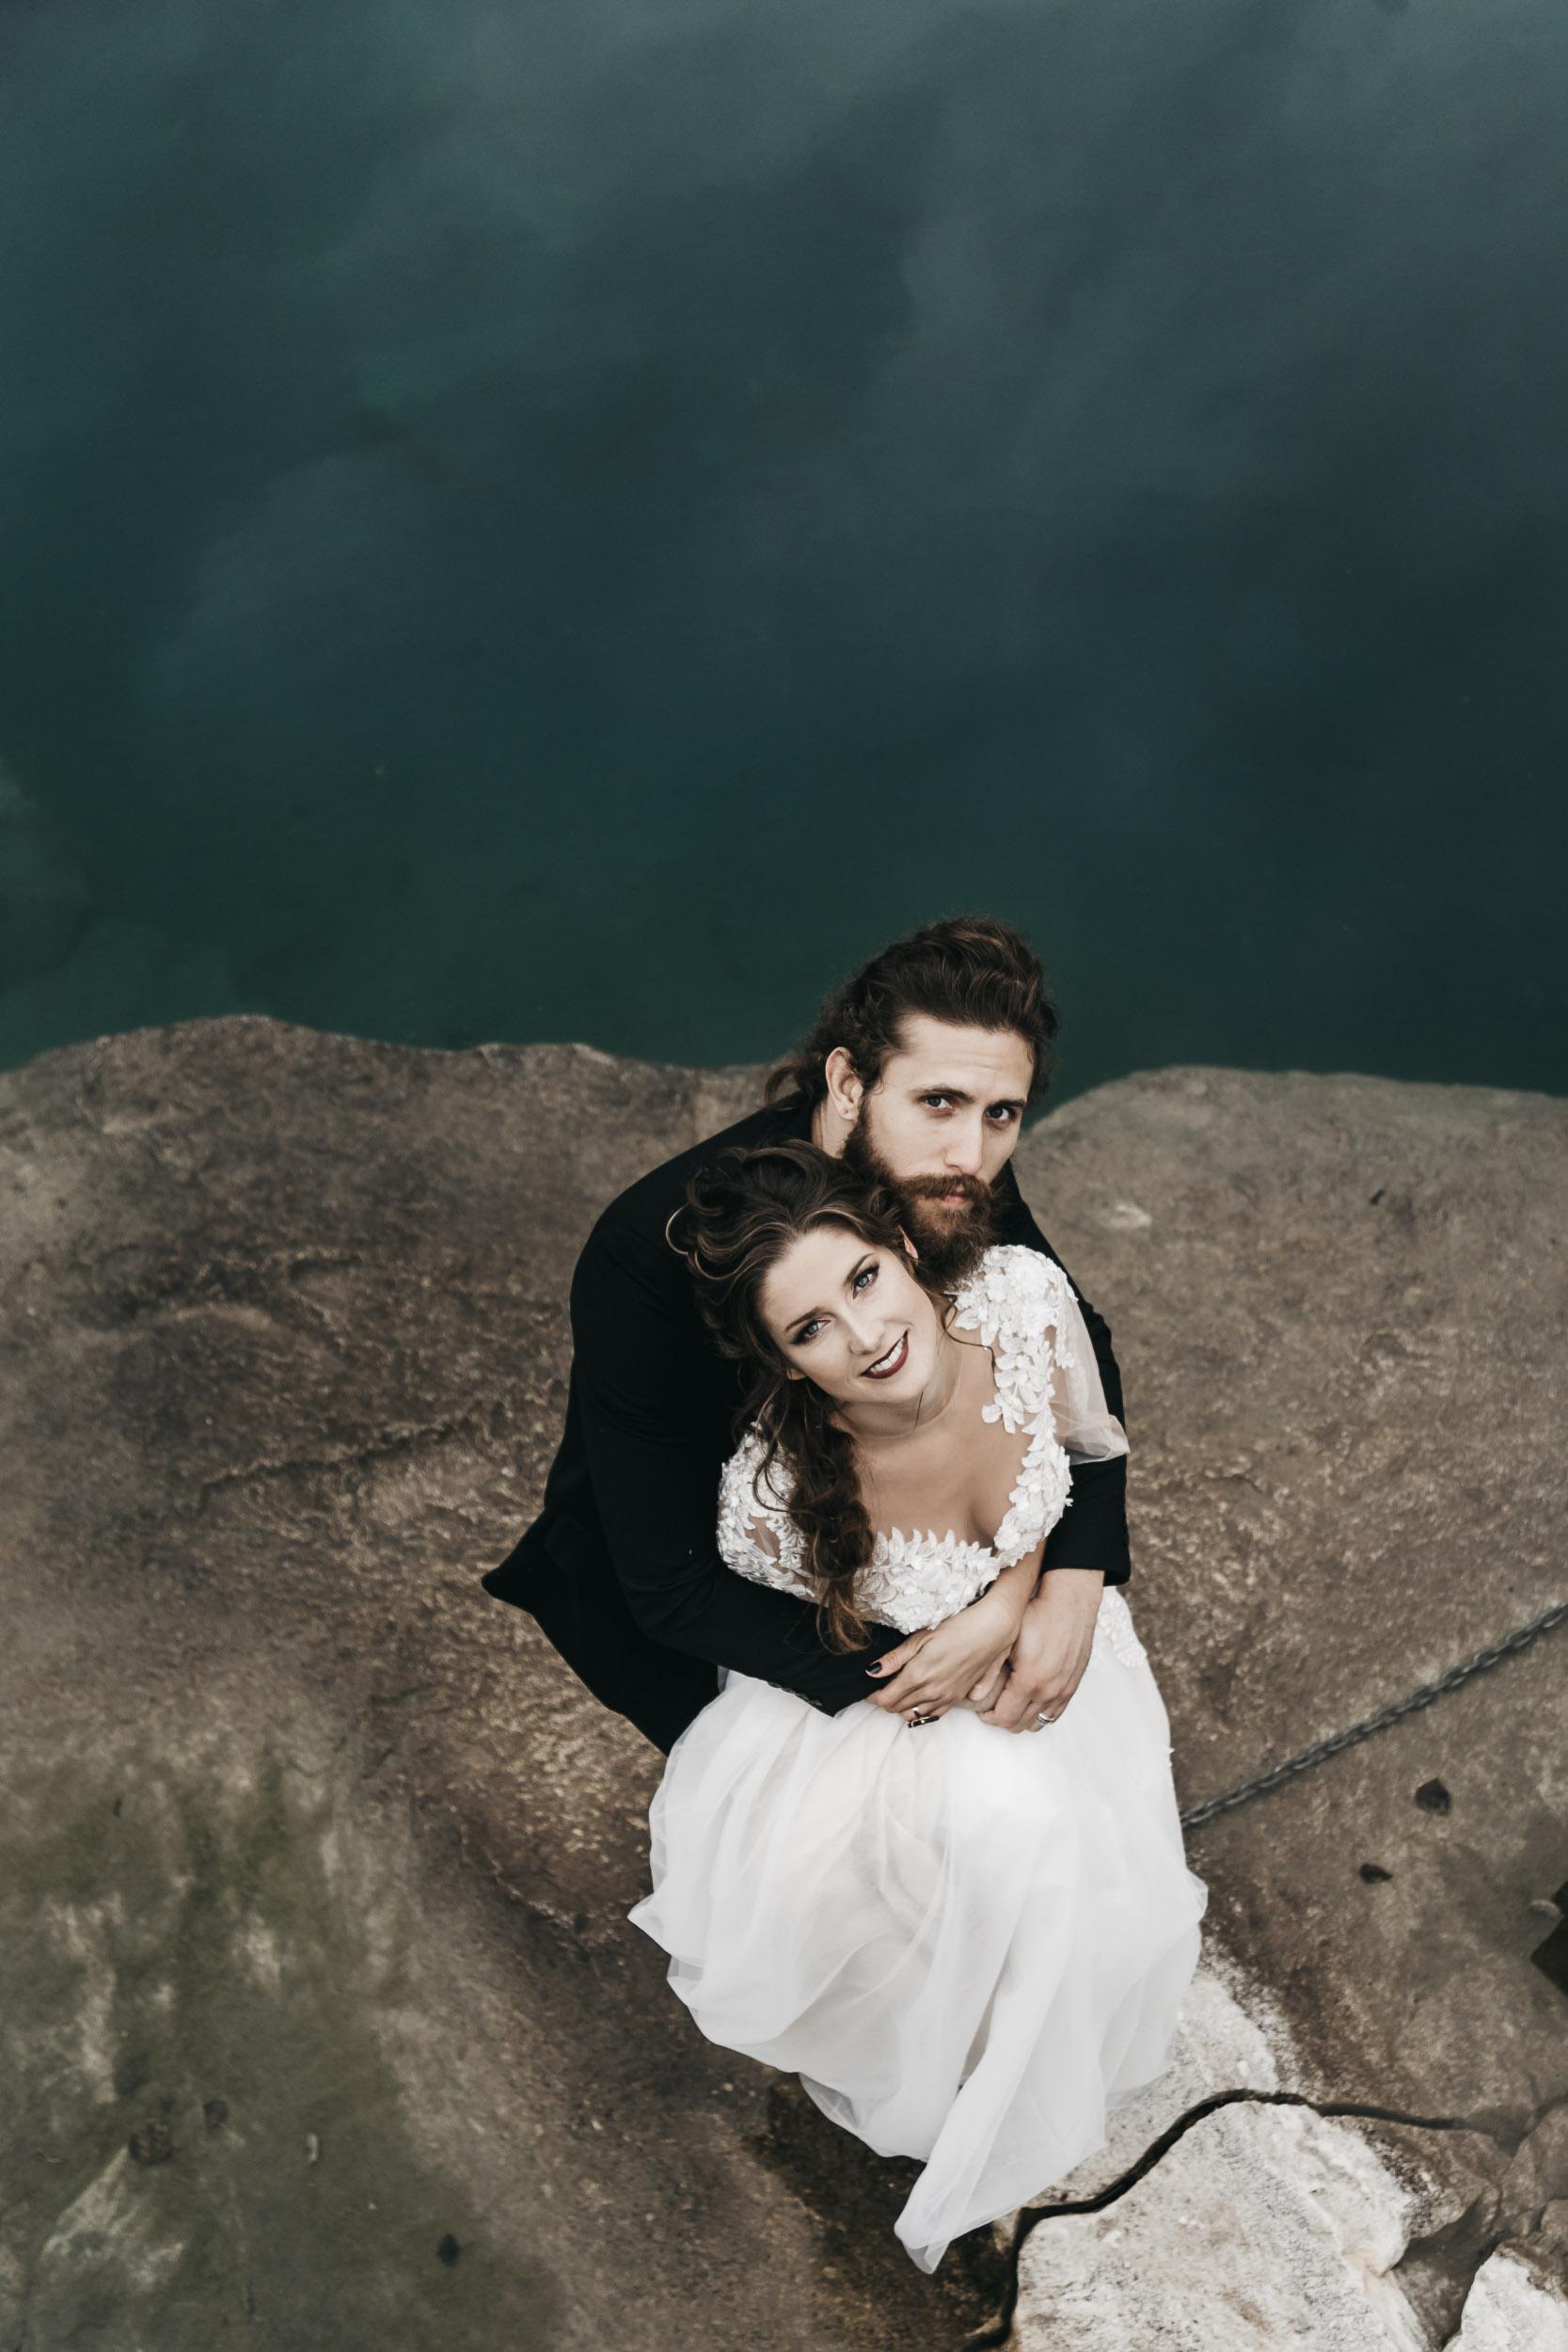 intimate-wedding-elopement-photographer-ottawa-toronto-0366.jpg